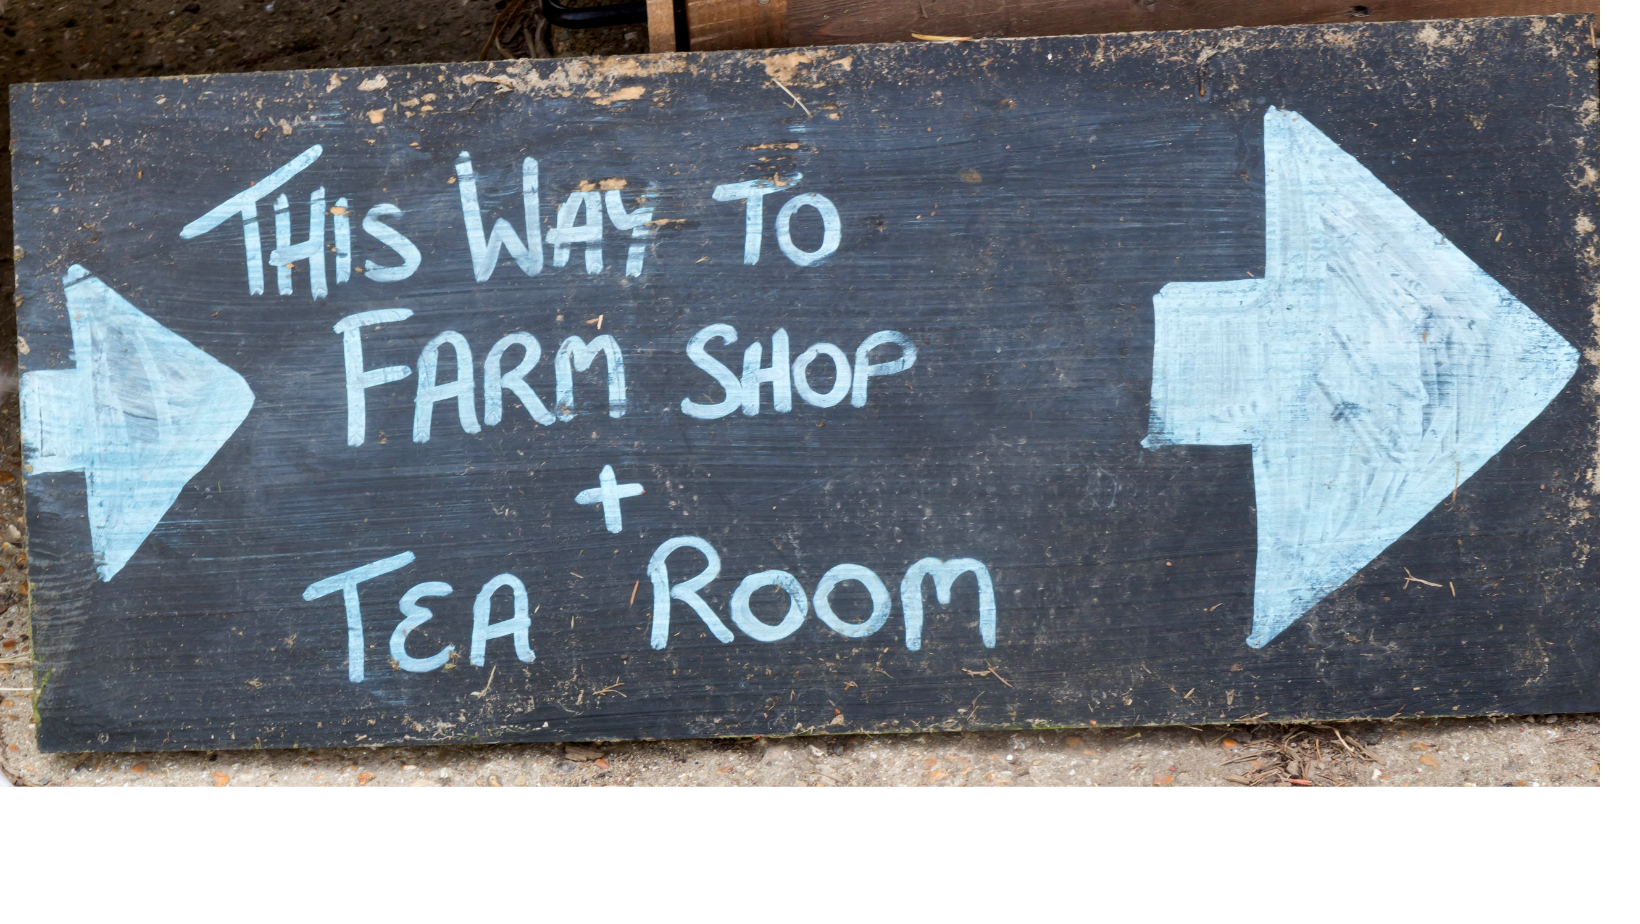 Farm Shop sign